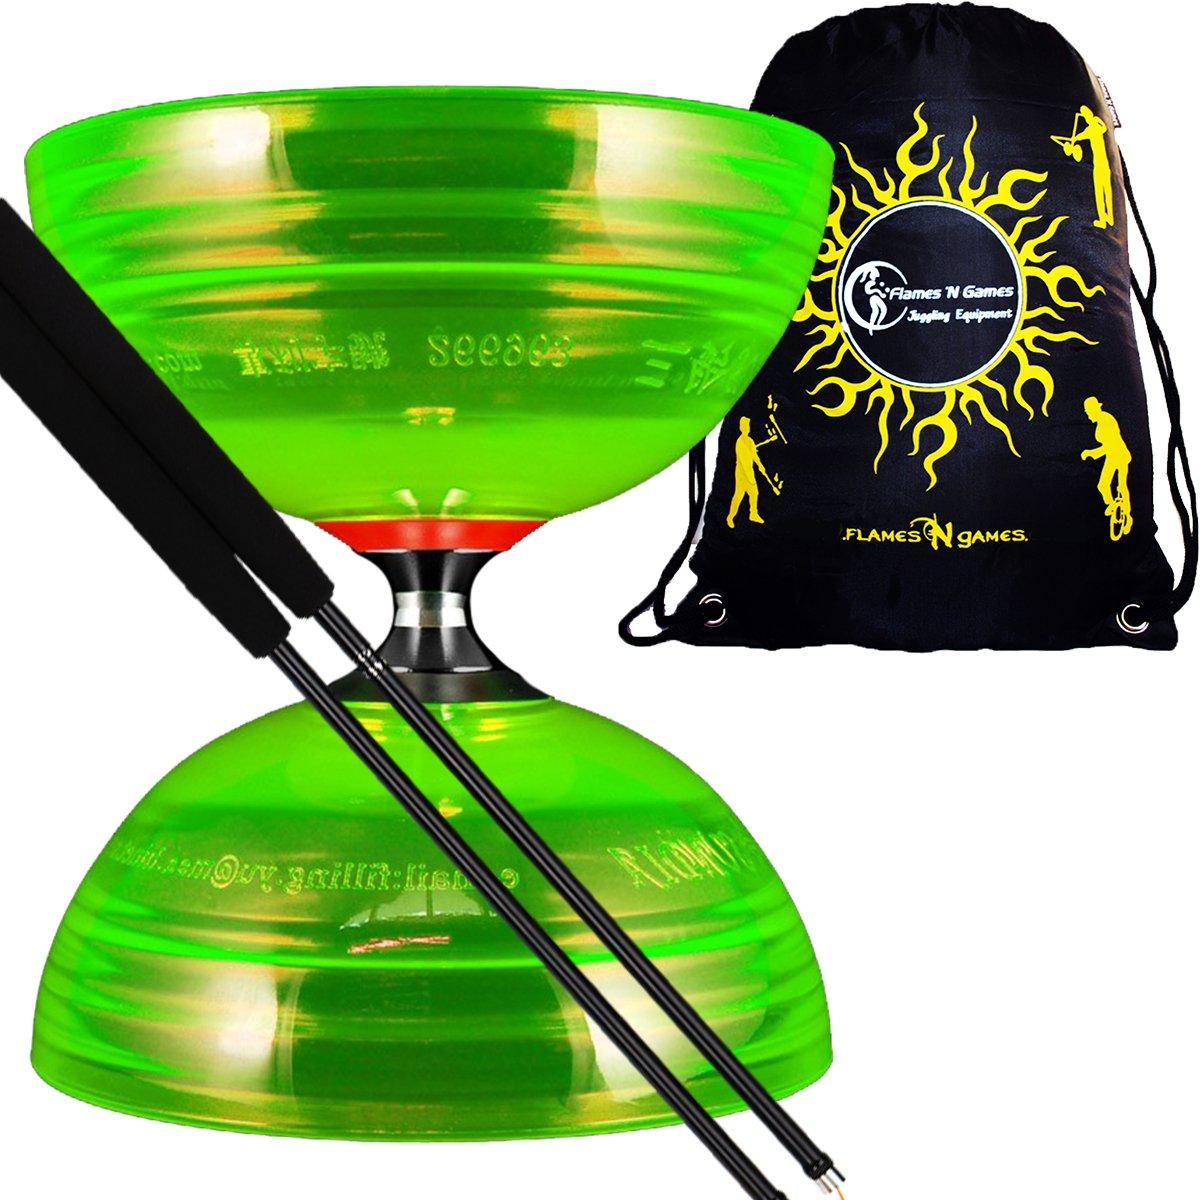 Sundia SHINING PRO Triple Bearing Diabolo Set (Green) + Henrys Fibre Diabolo Sticks, Diabolo String + Fabric Diablo Travel Bag.TOP OF THE RANGE Diabolo set!'